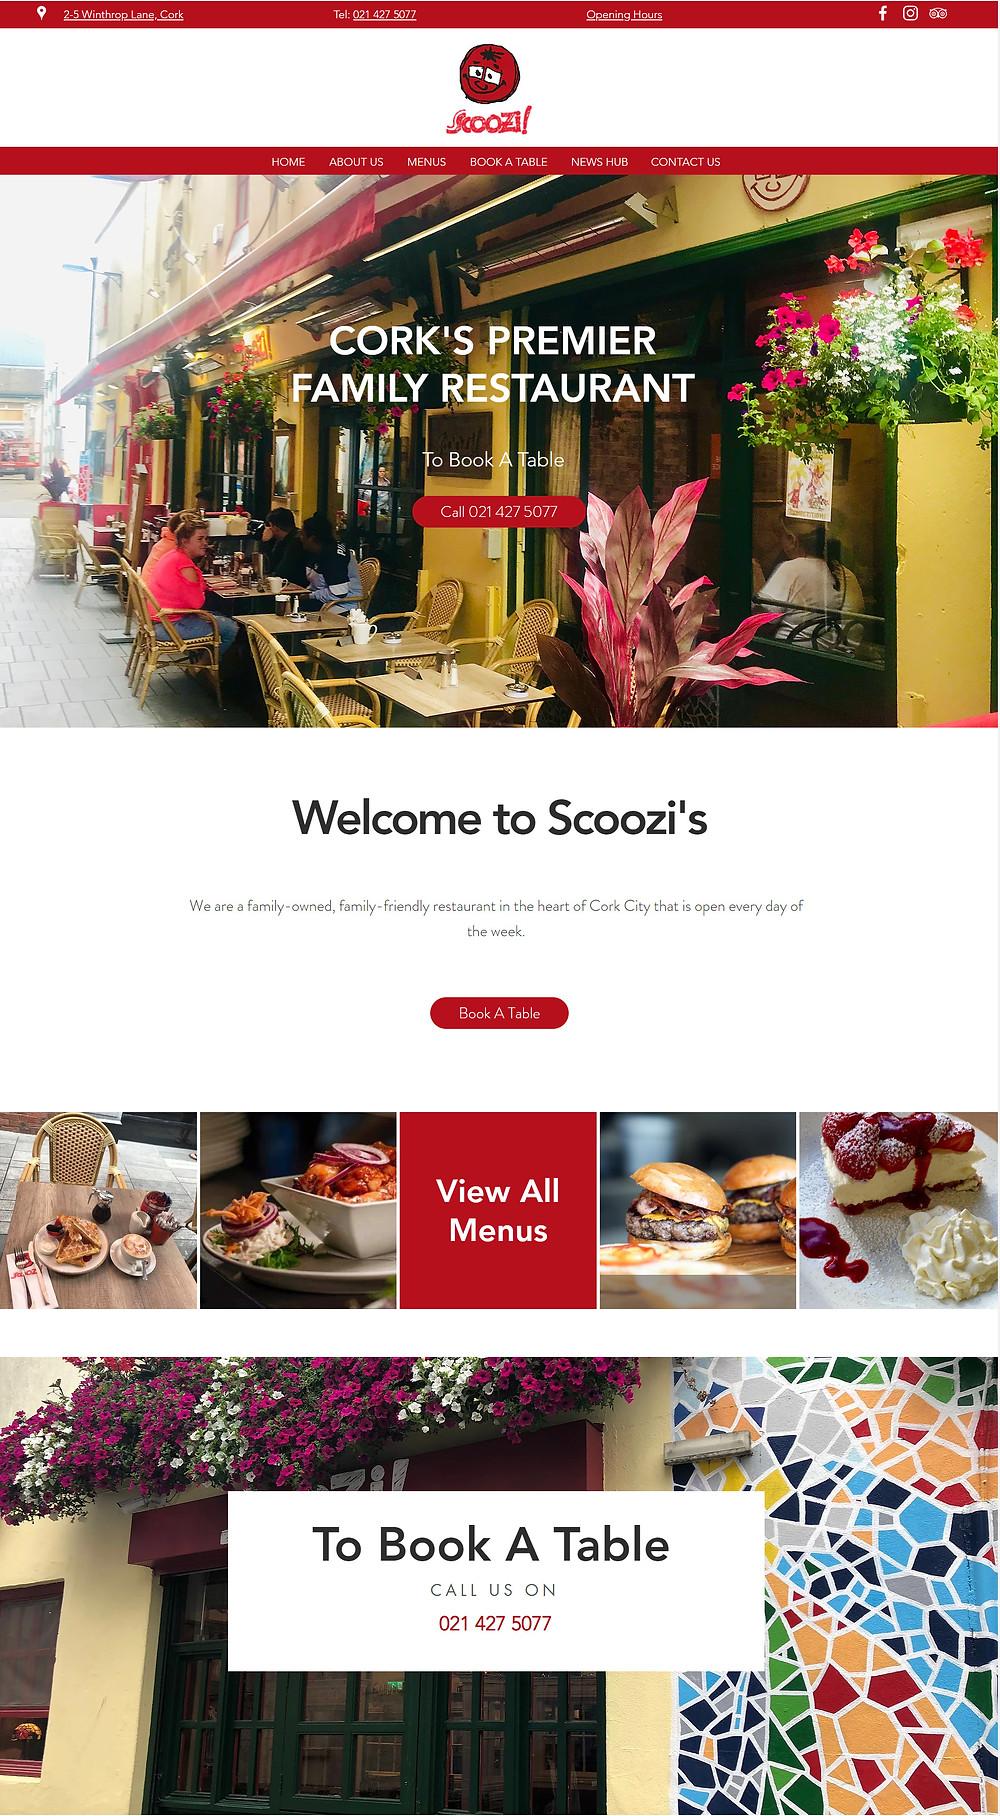 Scoozi restaurant in Cork